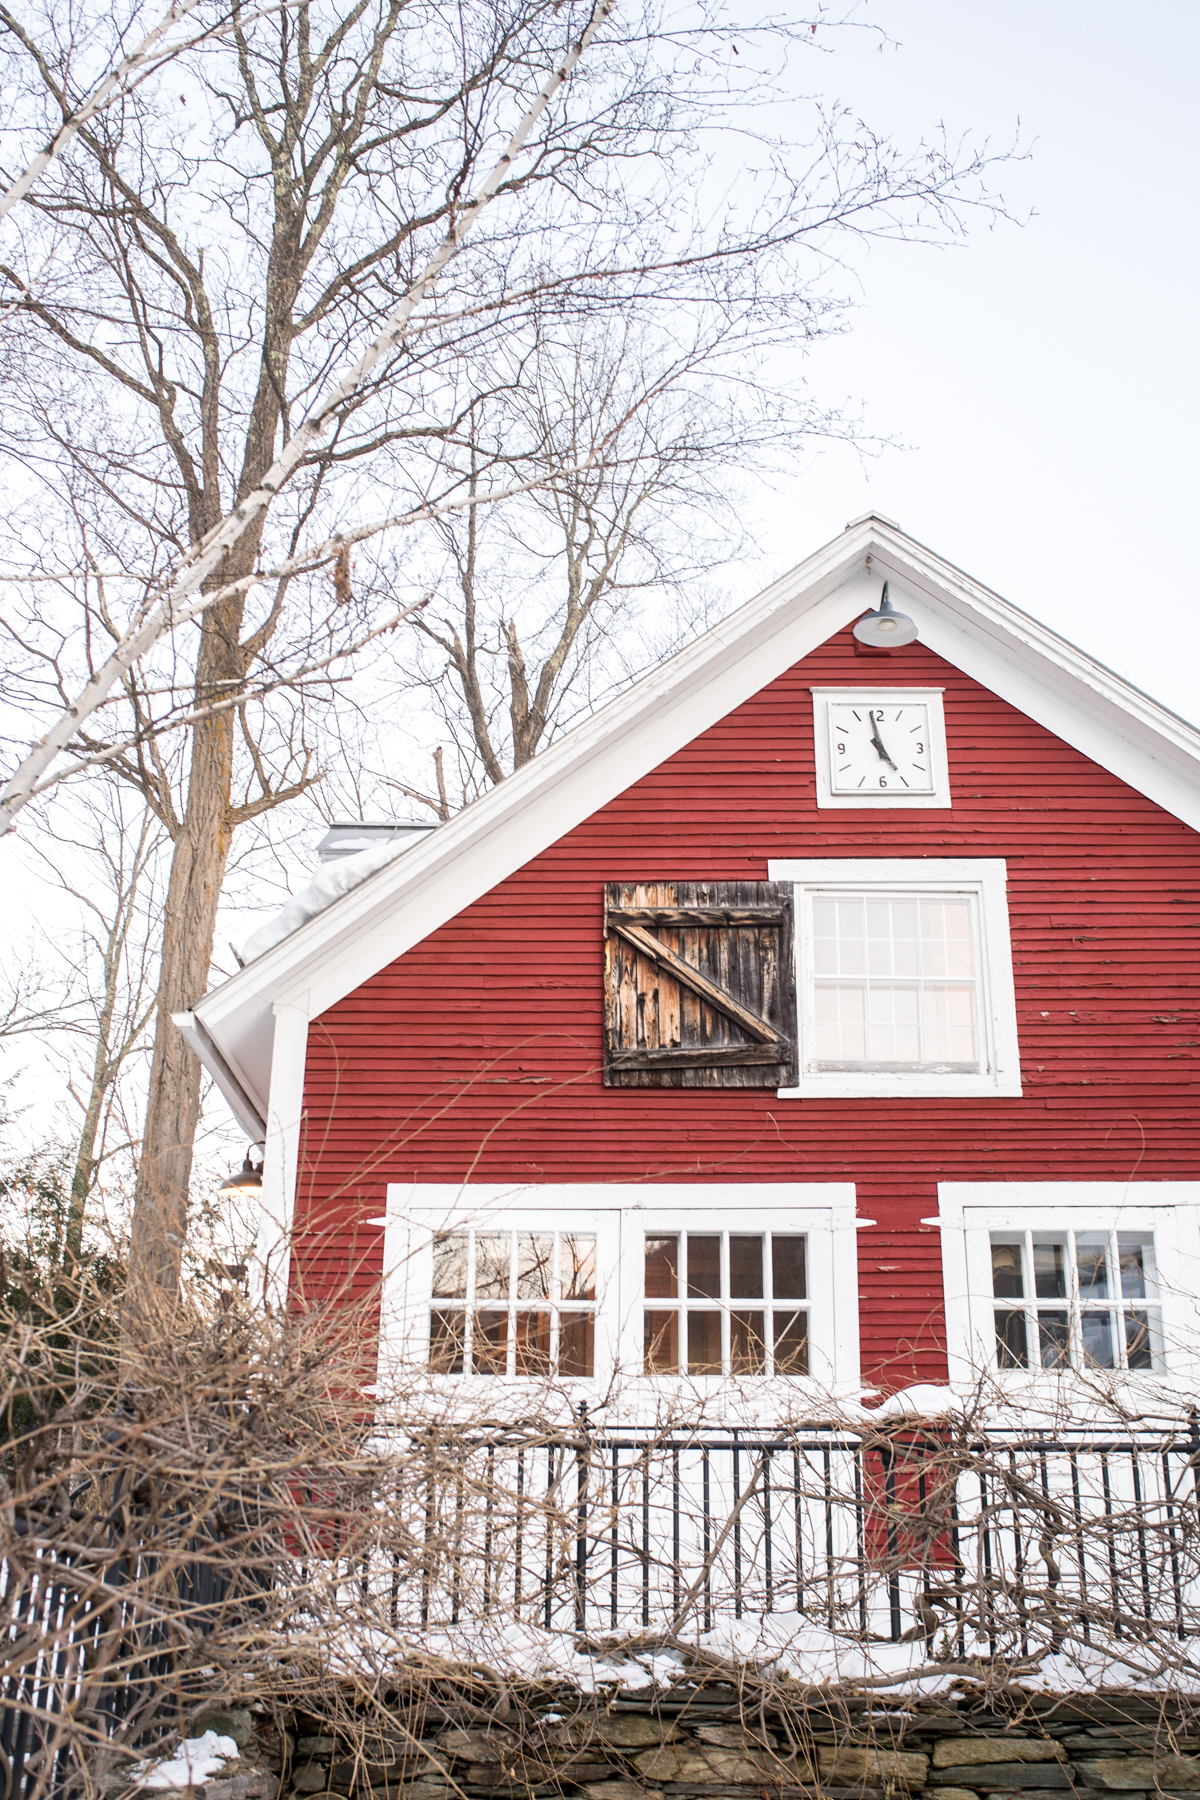 Stacie Flinner x The Pitcher Inn Relais Chateaux Vermont-27.jpg